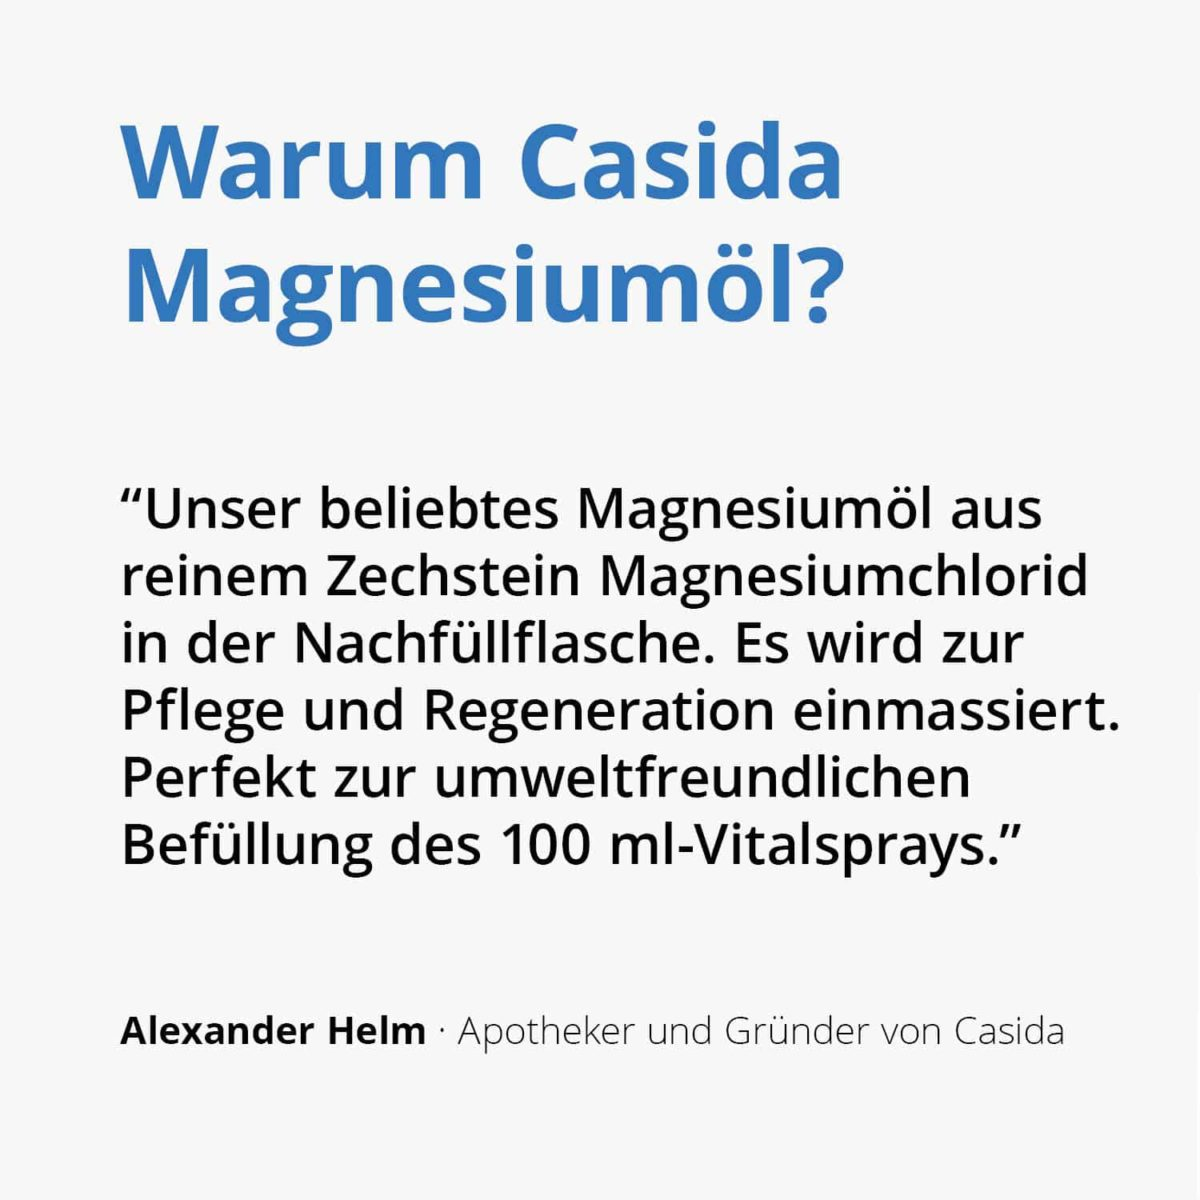 Casida Magnesiumöl Vital Zechstein 1000 ml 11730233 PZN Apotheke Nachfüllflasche Sport2